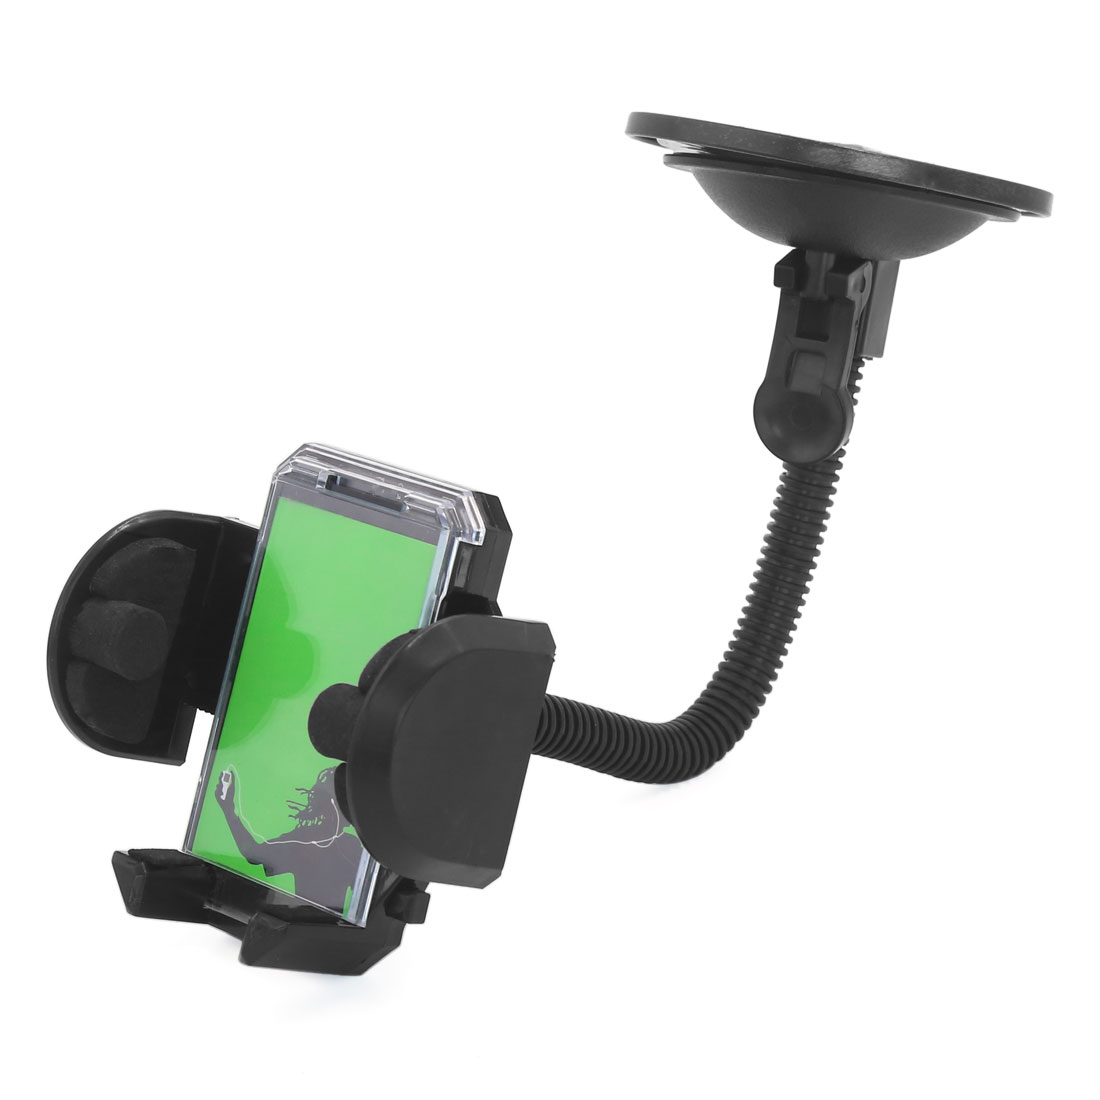 Universal Windshield Mount Cell Mobile Phone GPS Holder Bracket Black